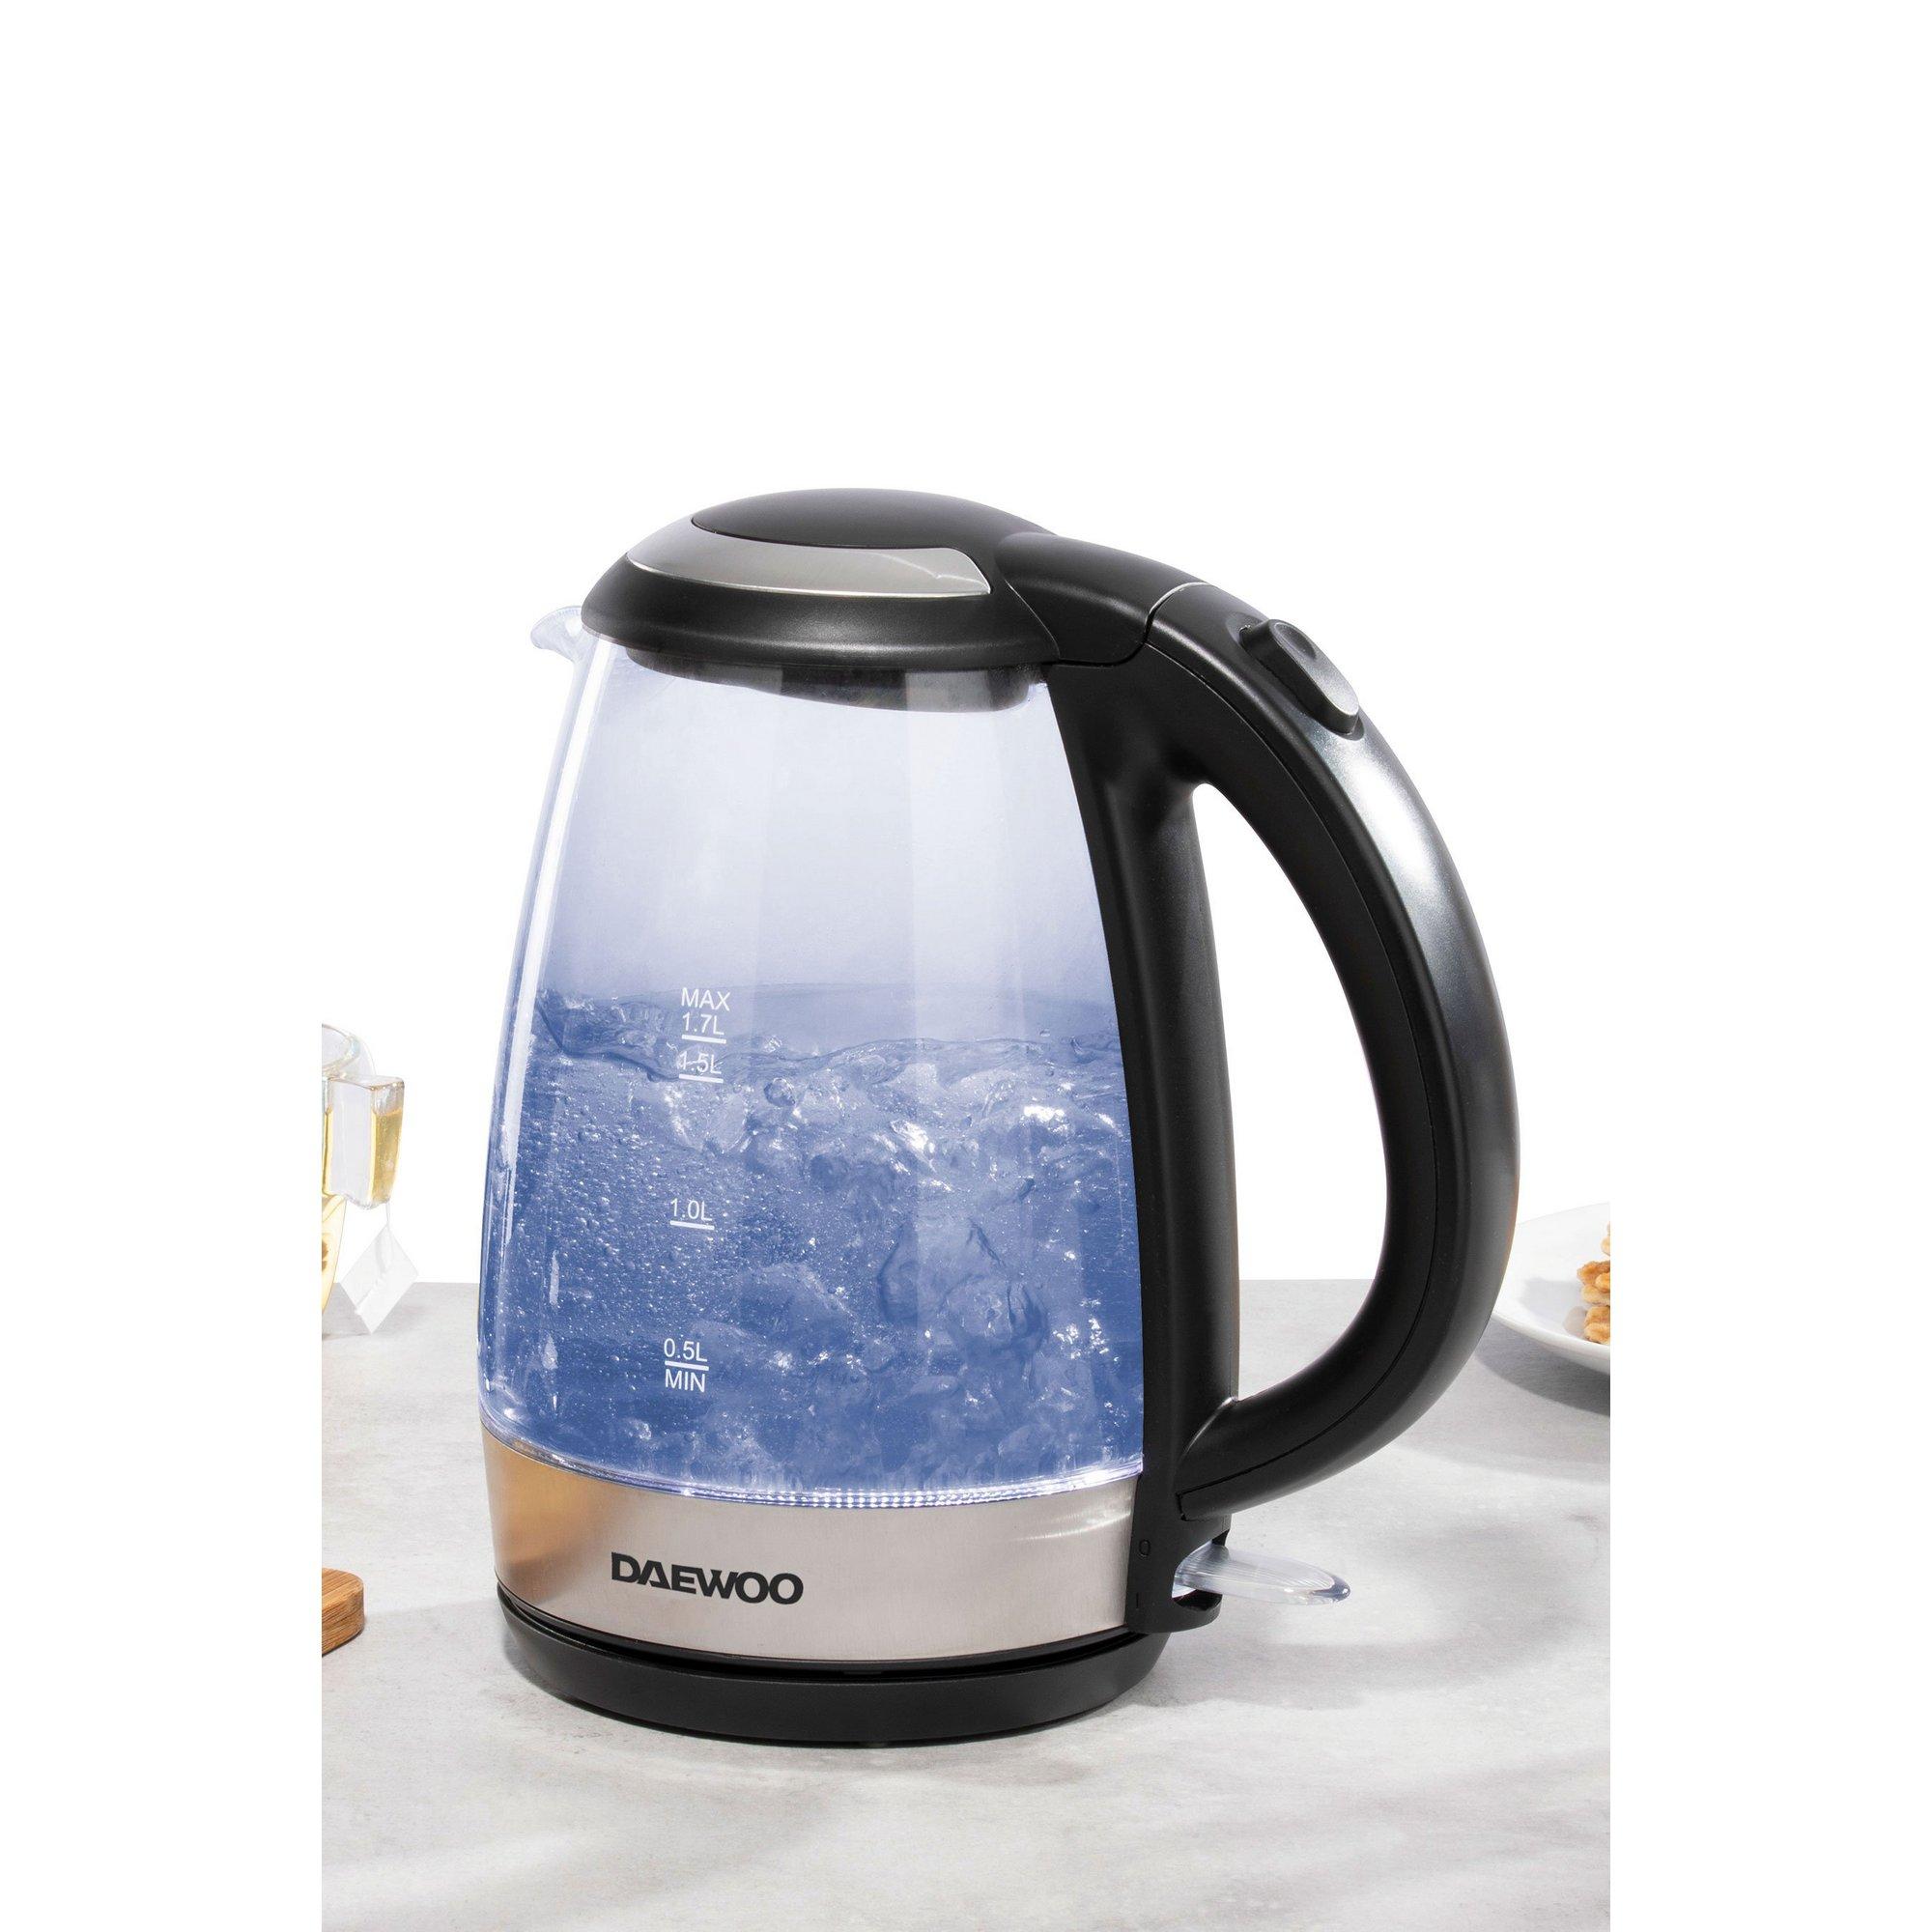 Image of Daewoo 1.7L 2200W Glass Kettle